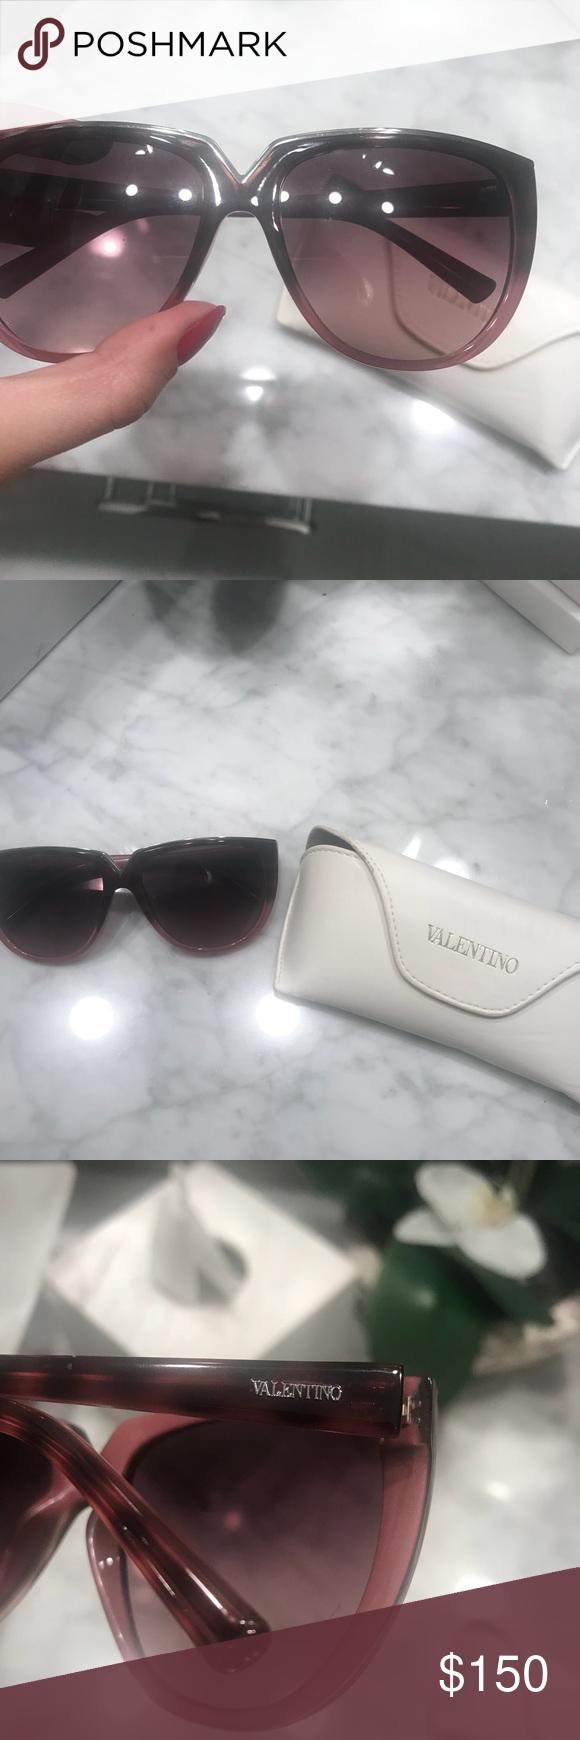 d1788f3c1227 Valentino Sunglasses